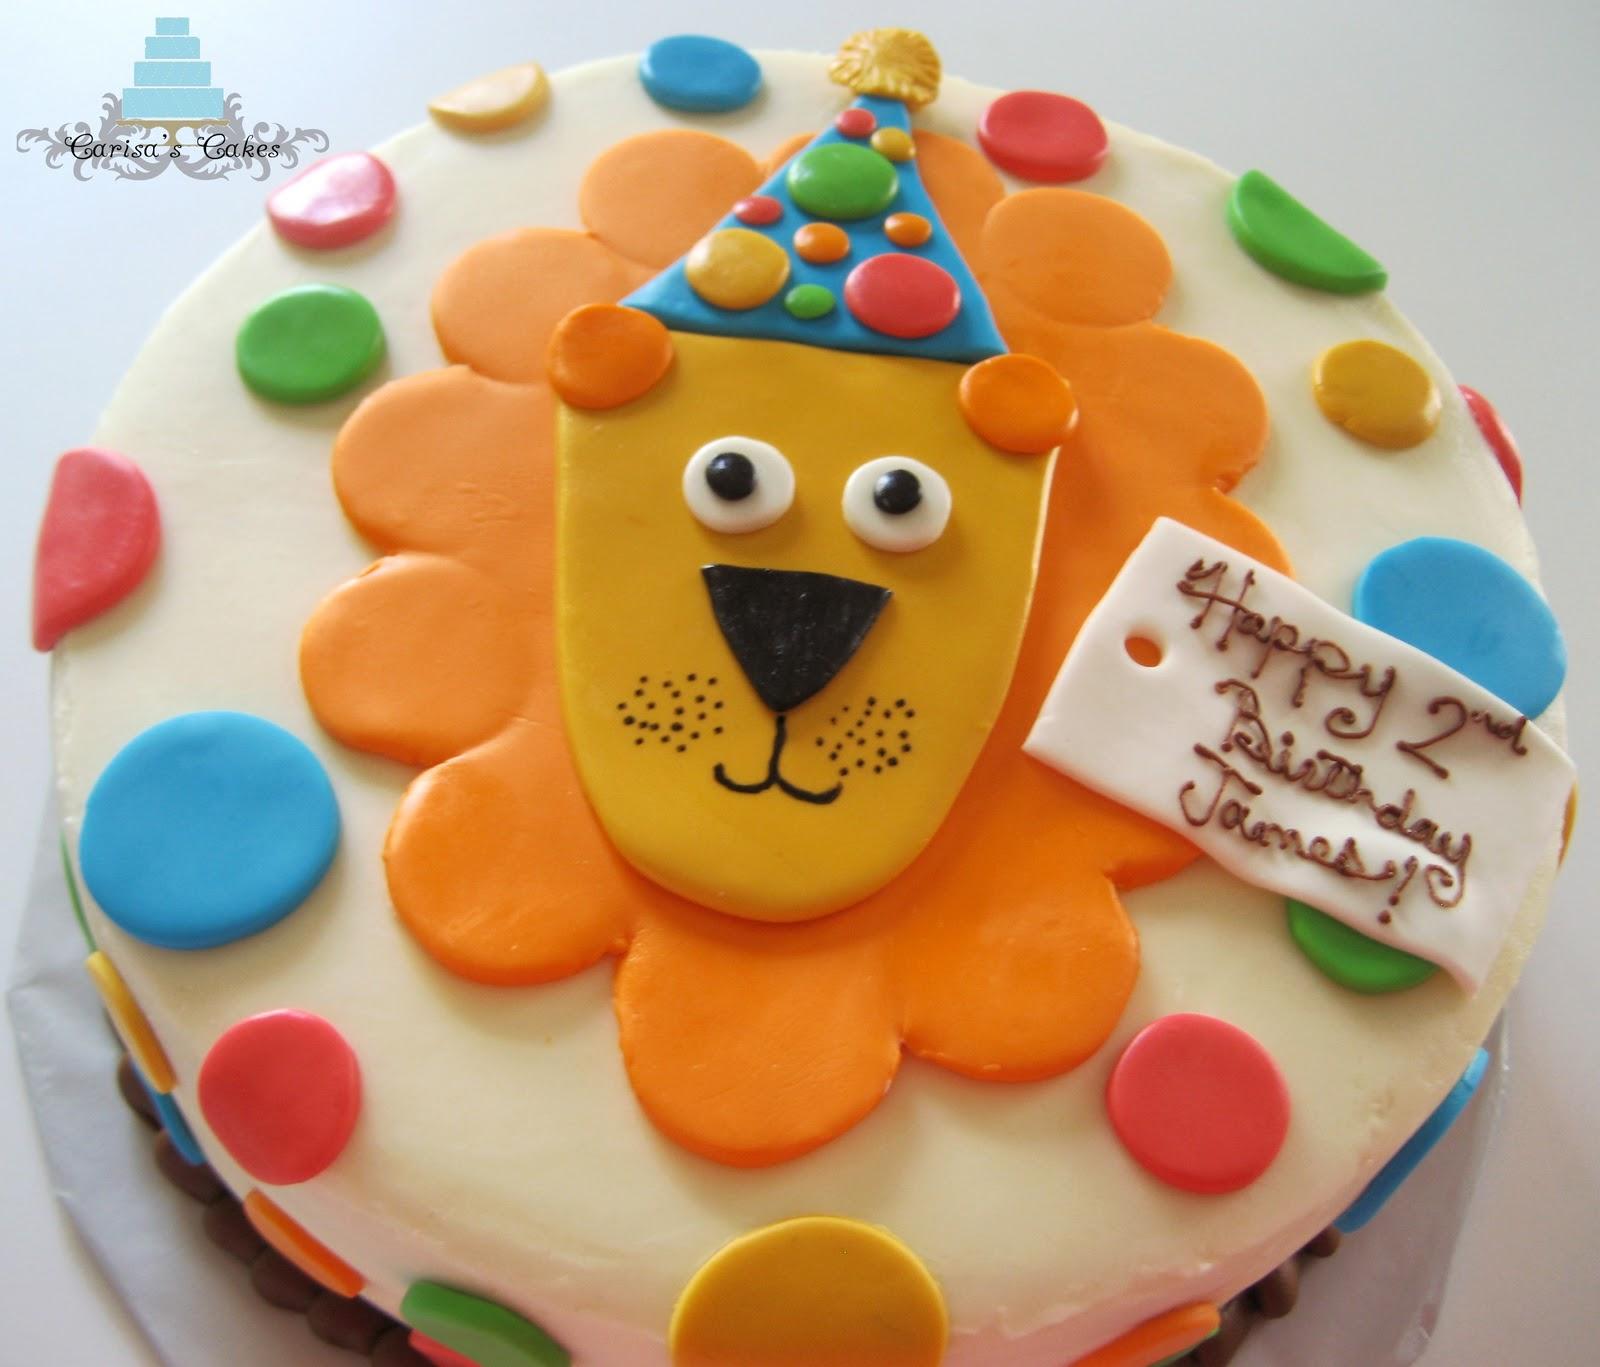 Carisas Cakes April 2011